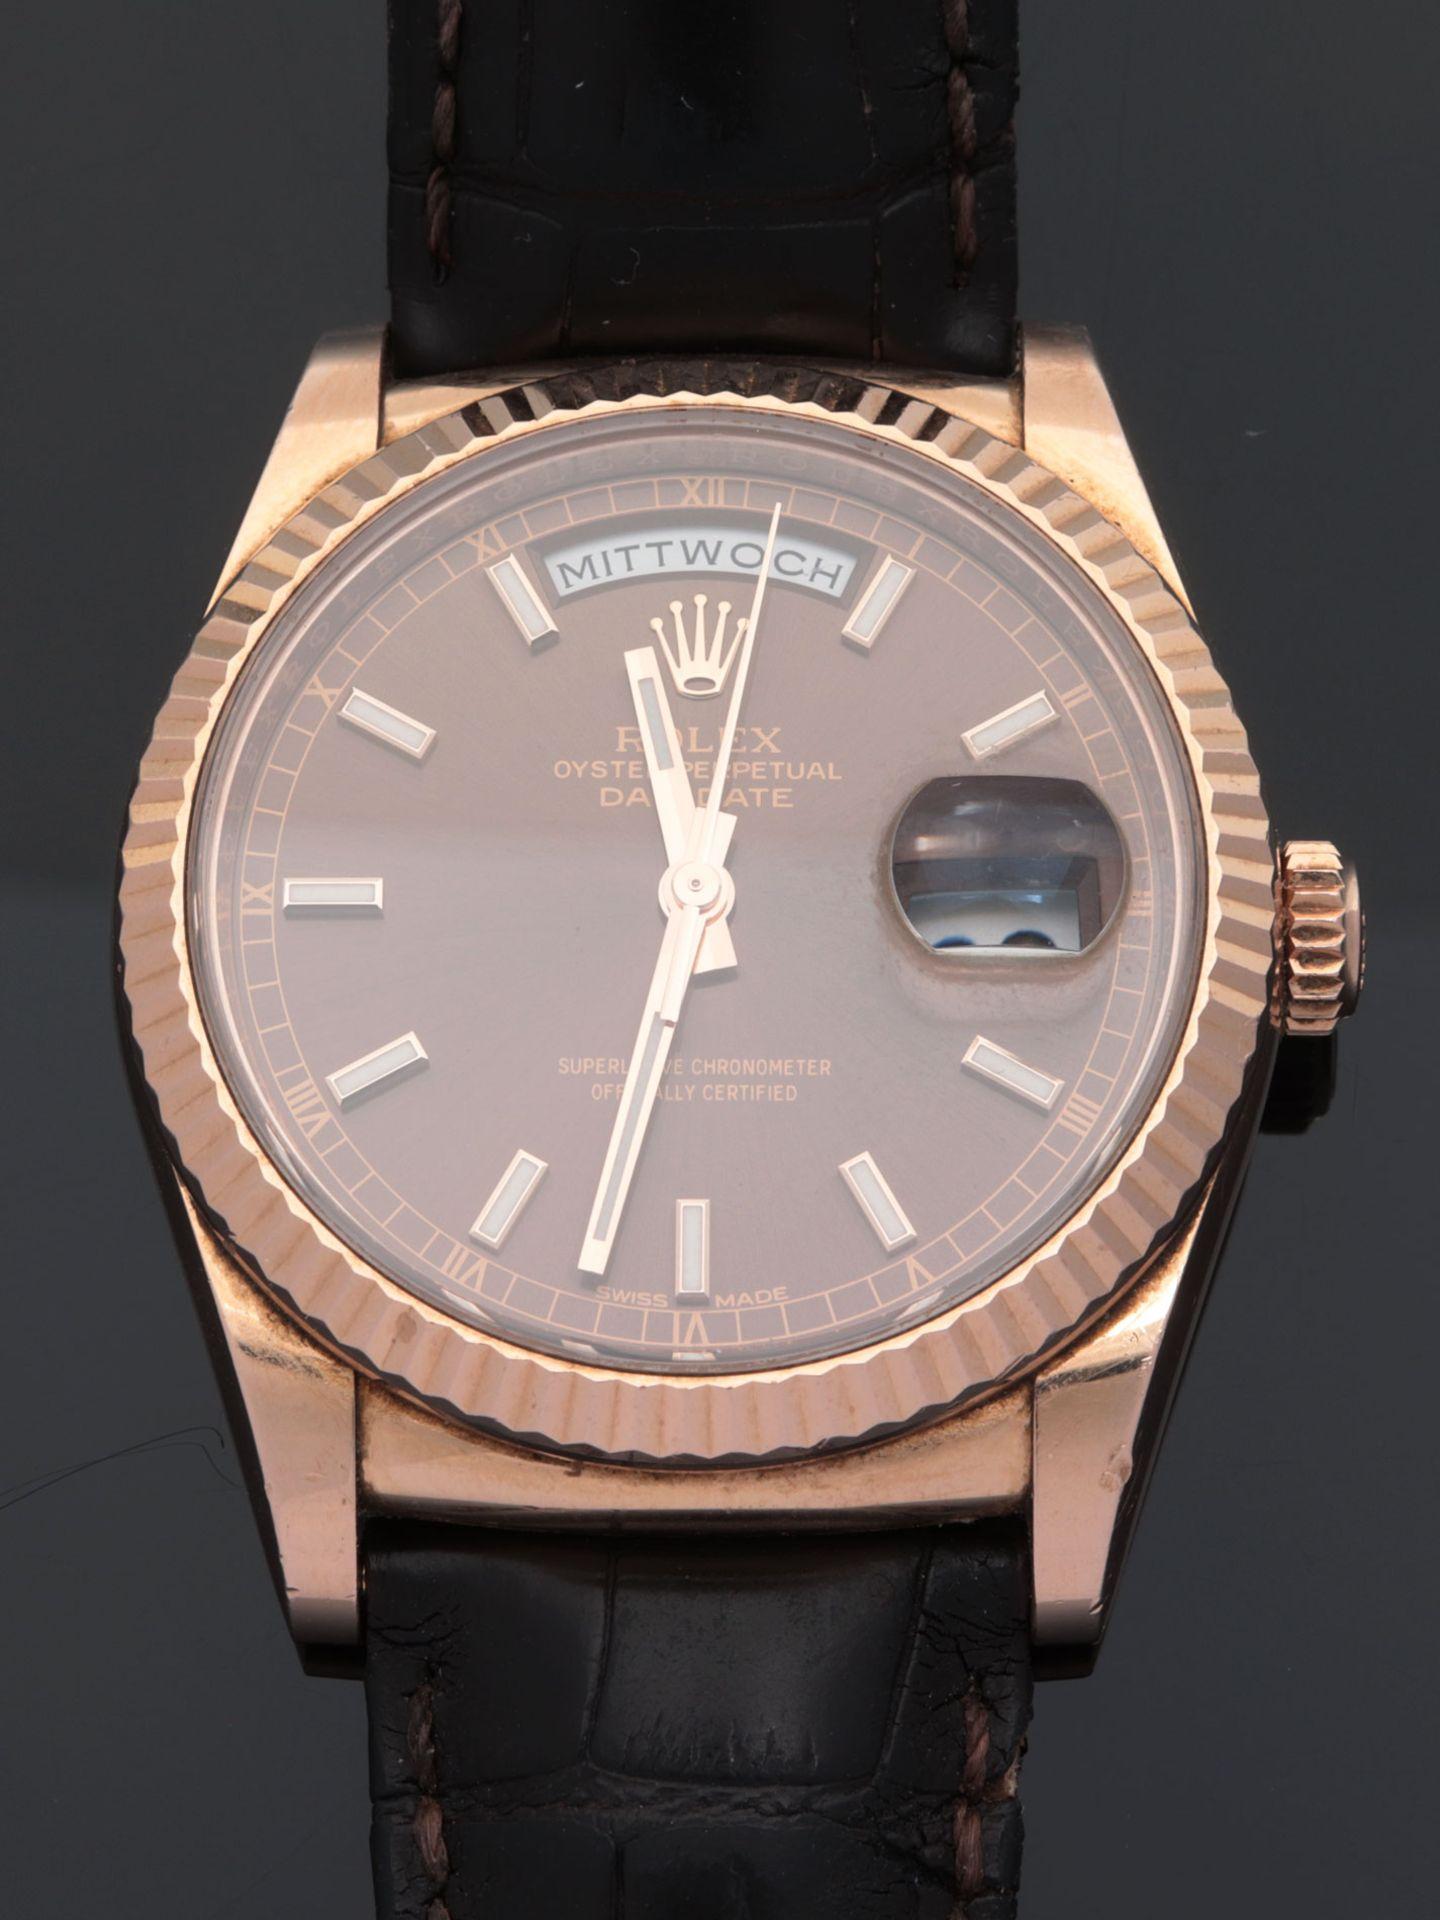 Rolex - Herrenarmbanduhr Roségold 750, Rolex Day-Date Oyster Perpetual, Superlative C - Image 13 of 17